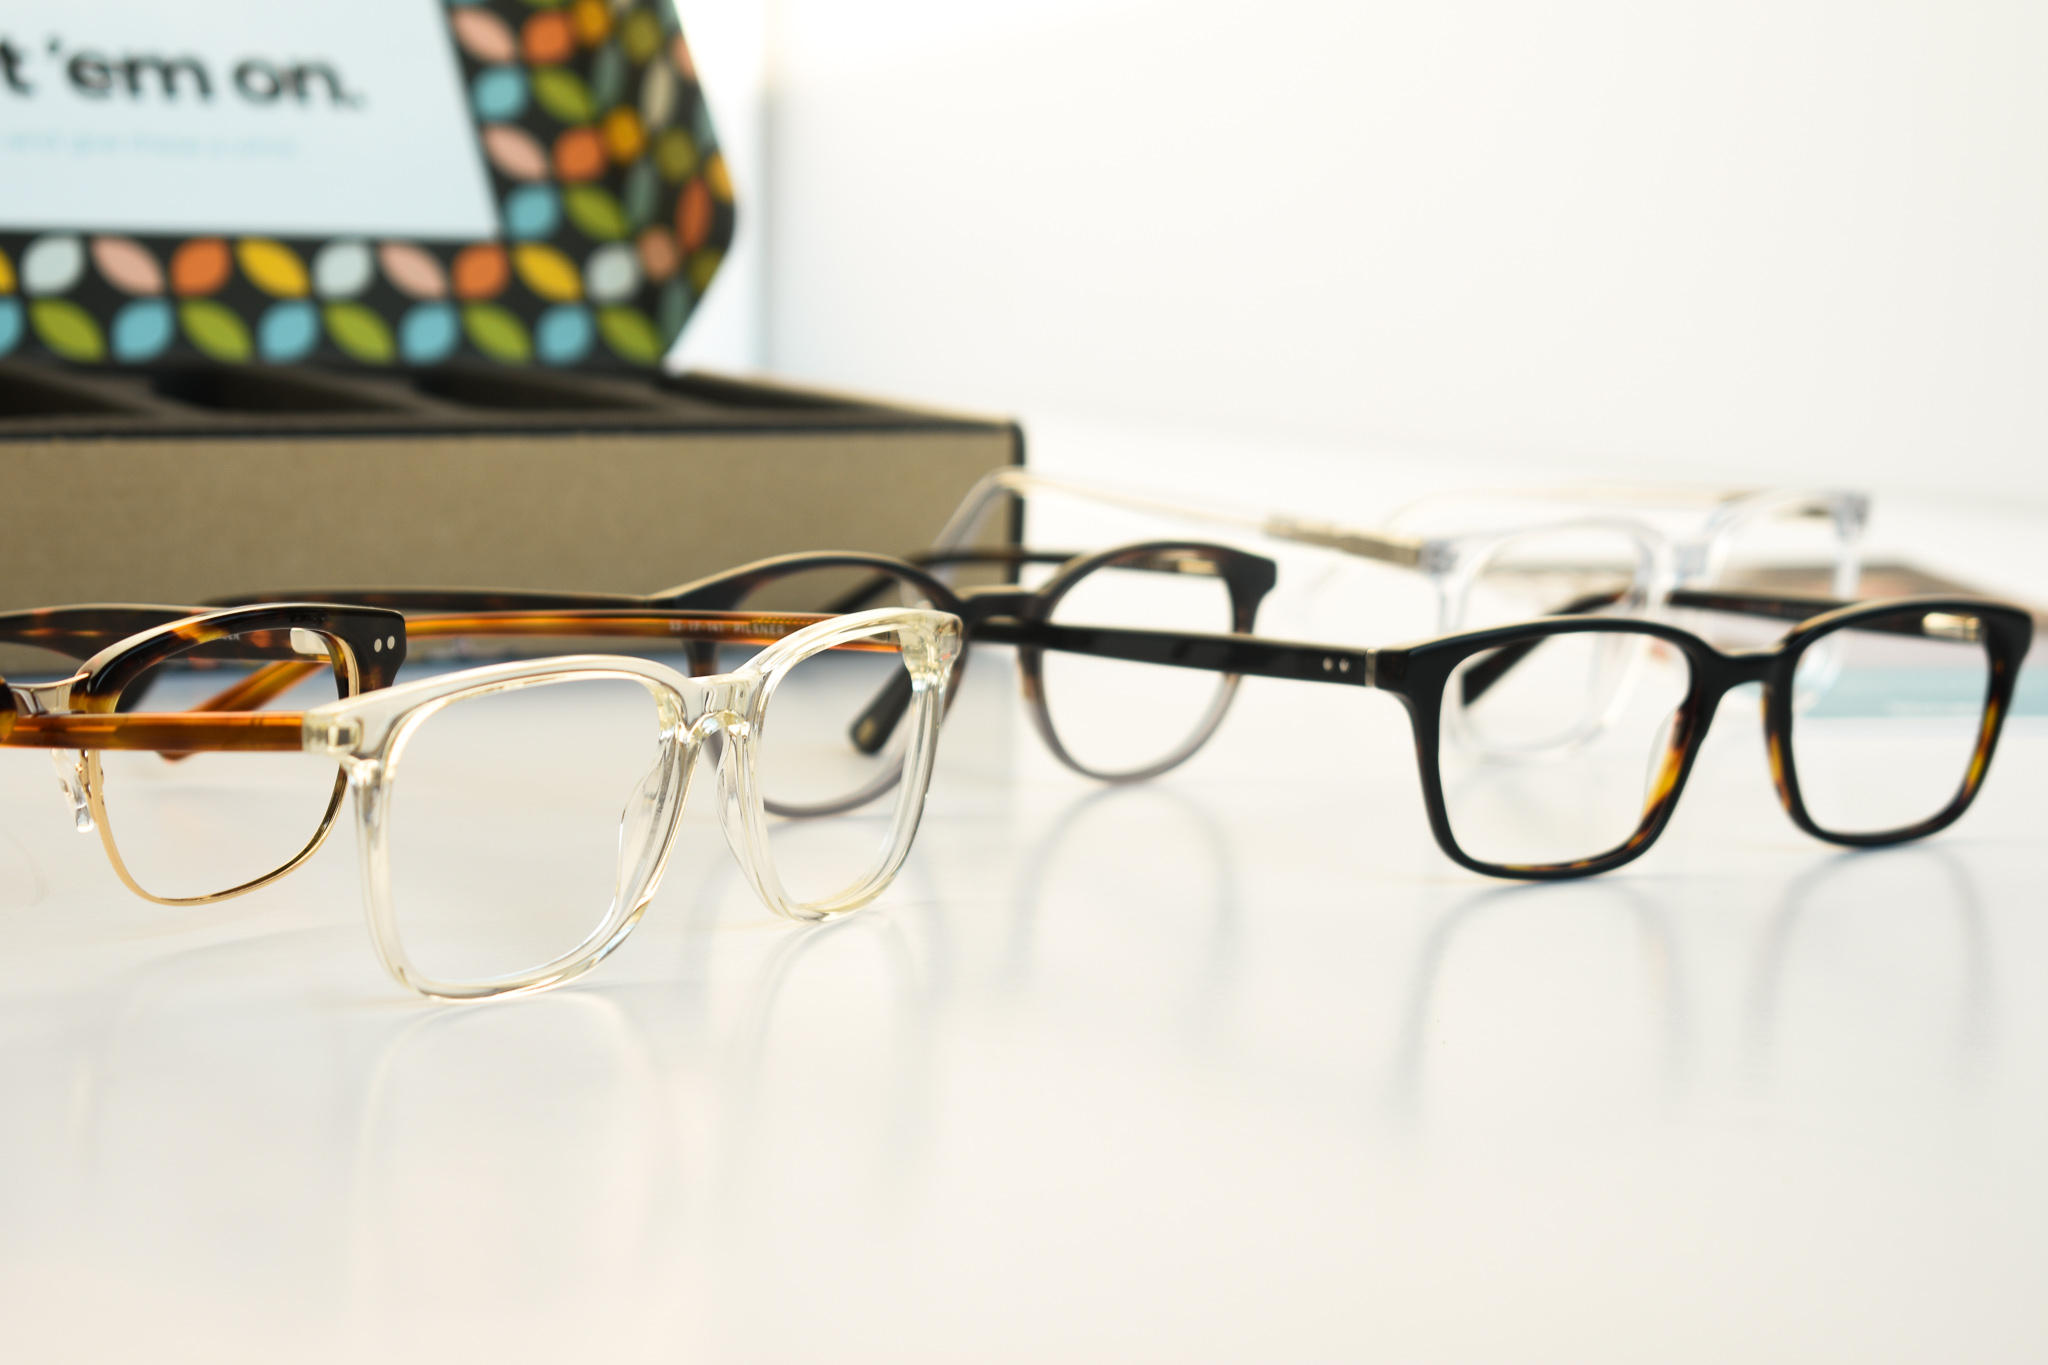 Liingo glasses on white background